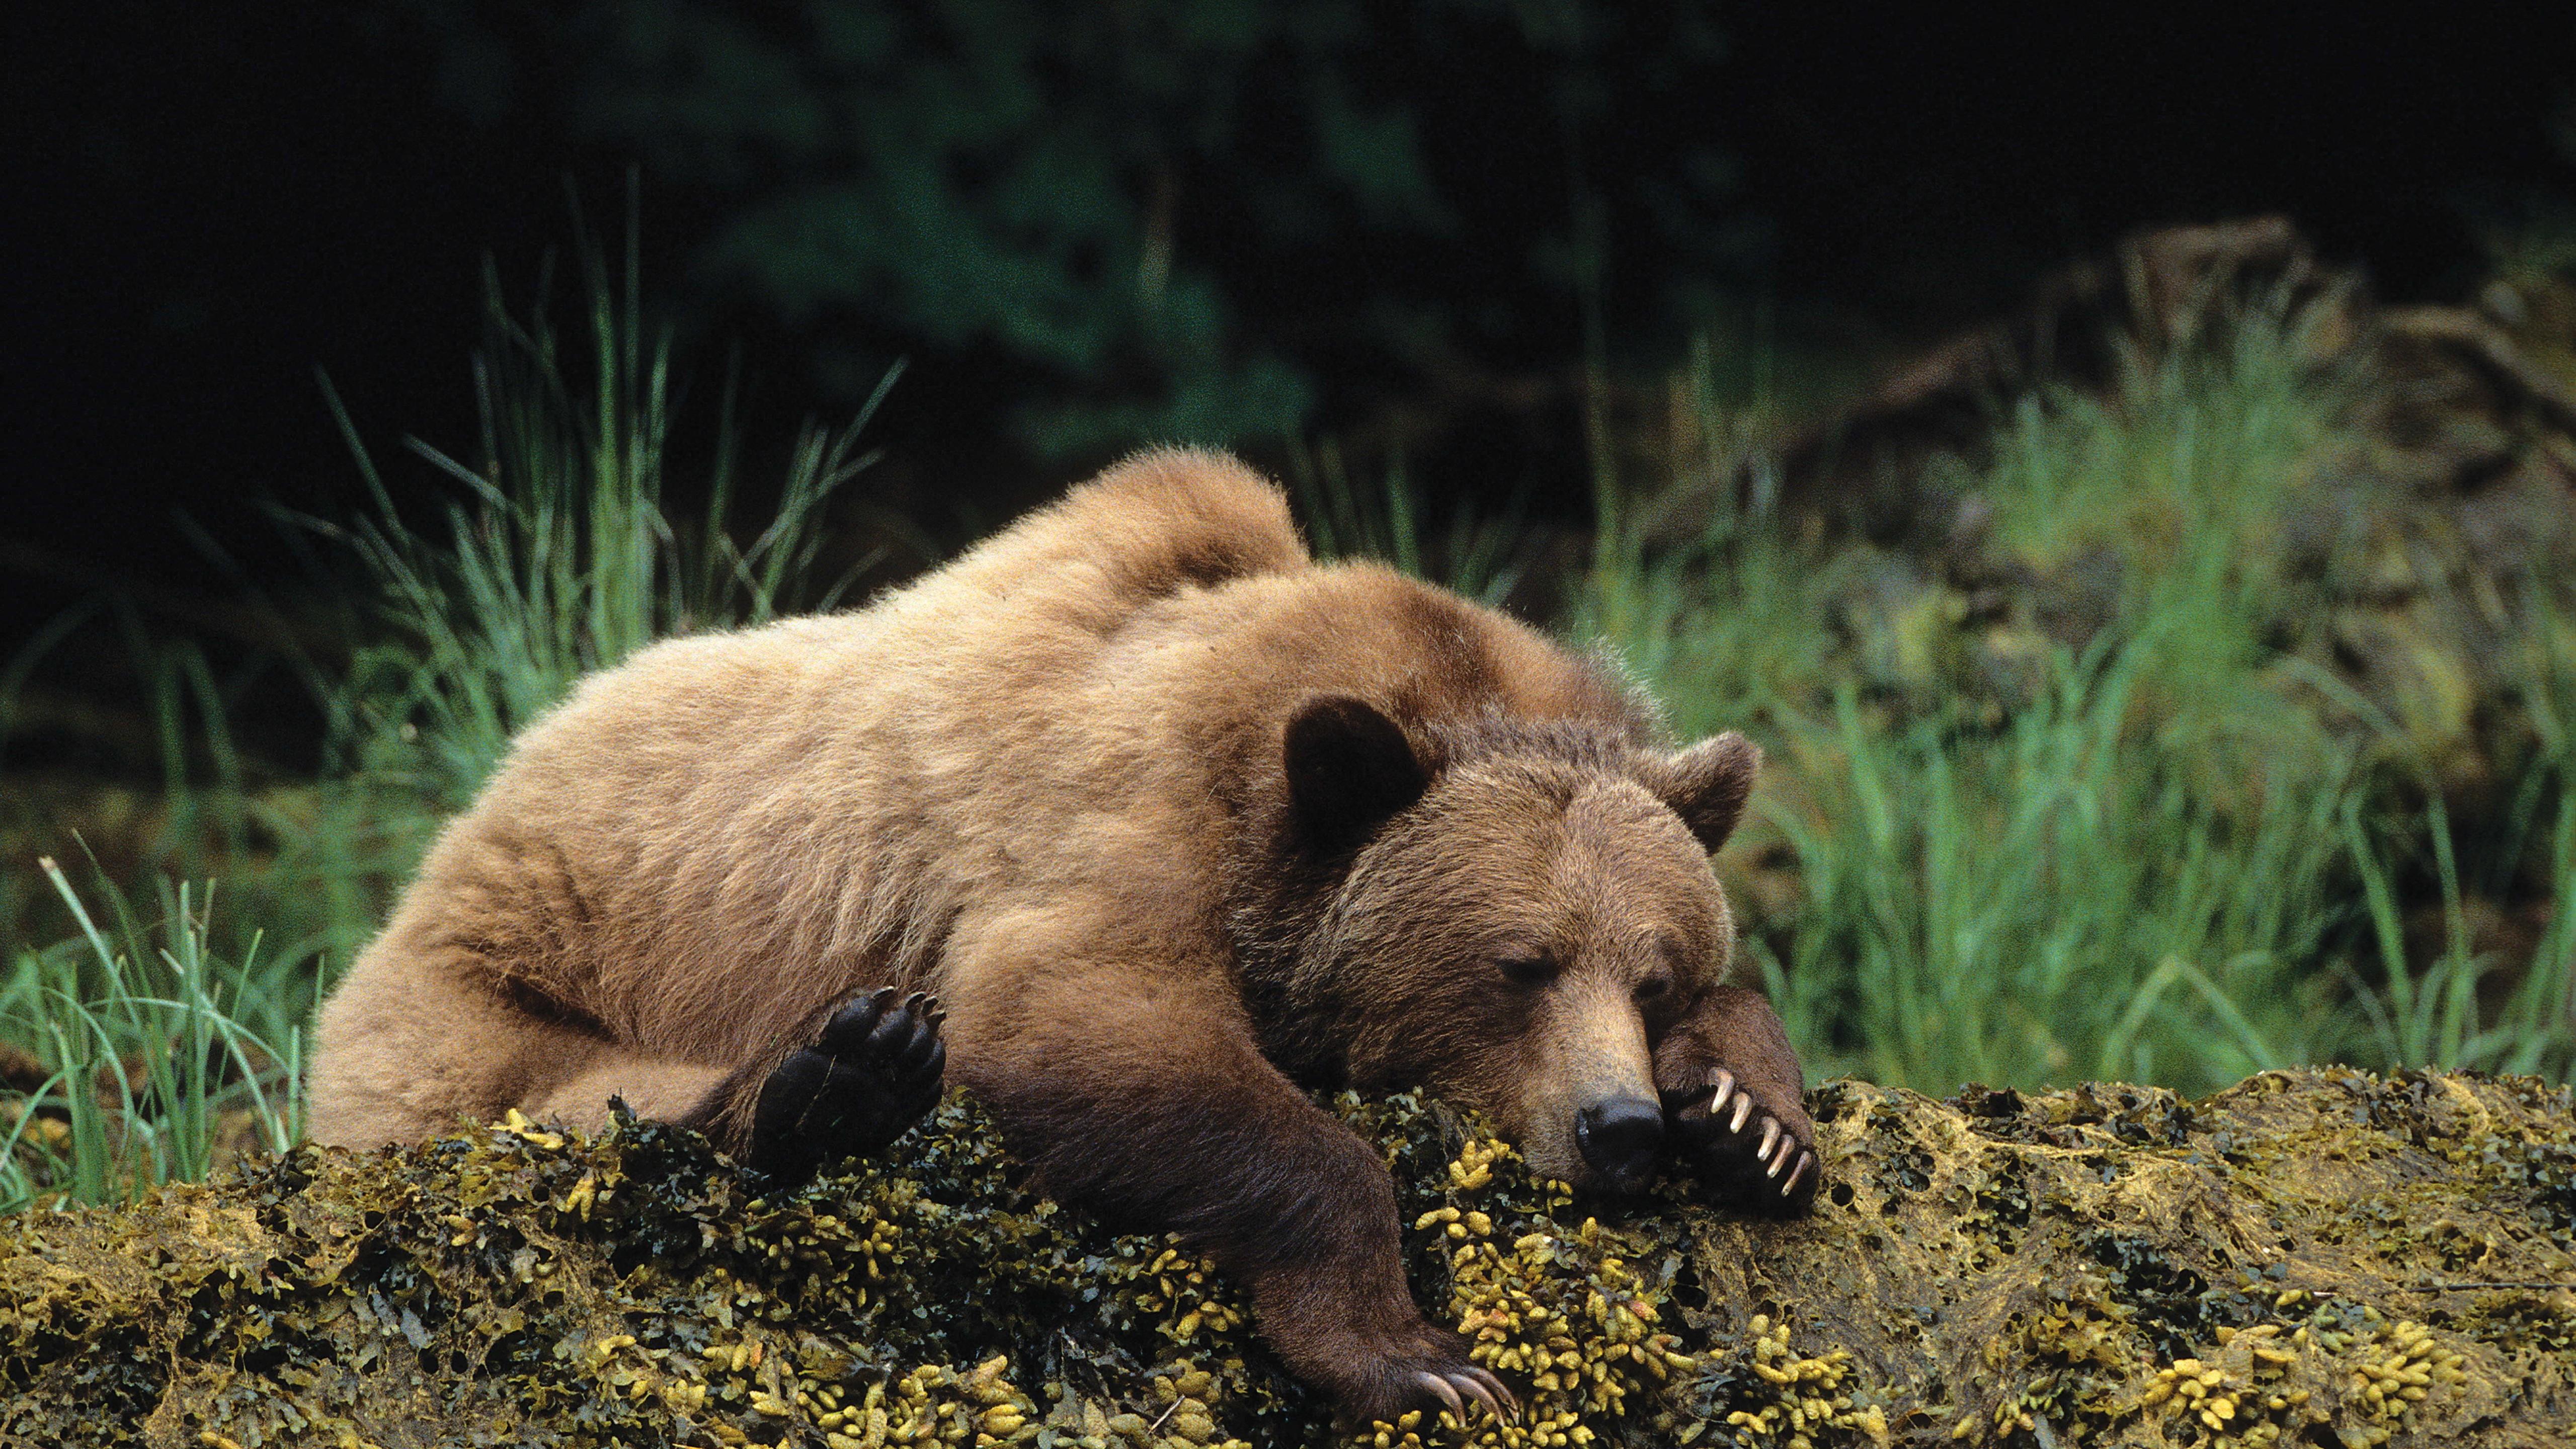 Wallpaper bear, cute animals, sleep, 4k, Animals #16106